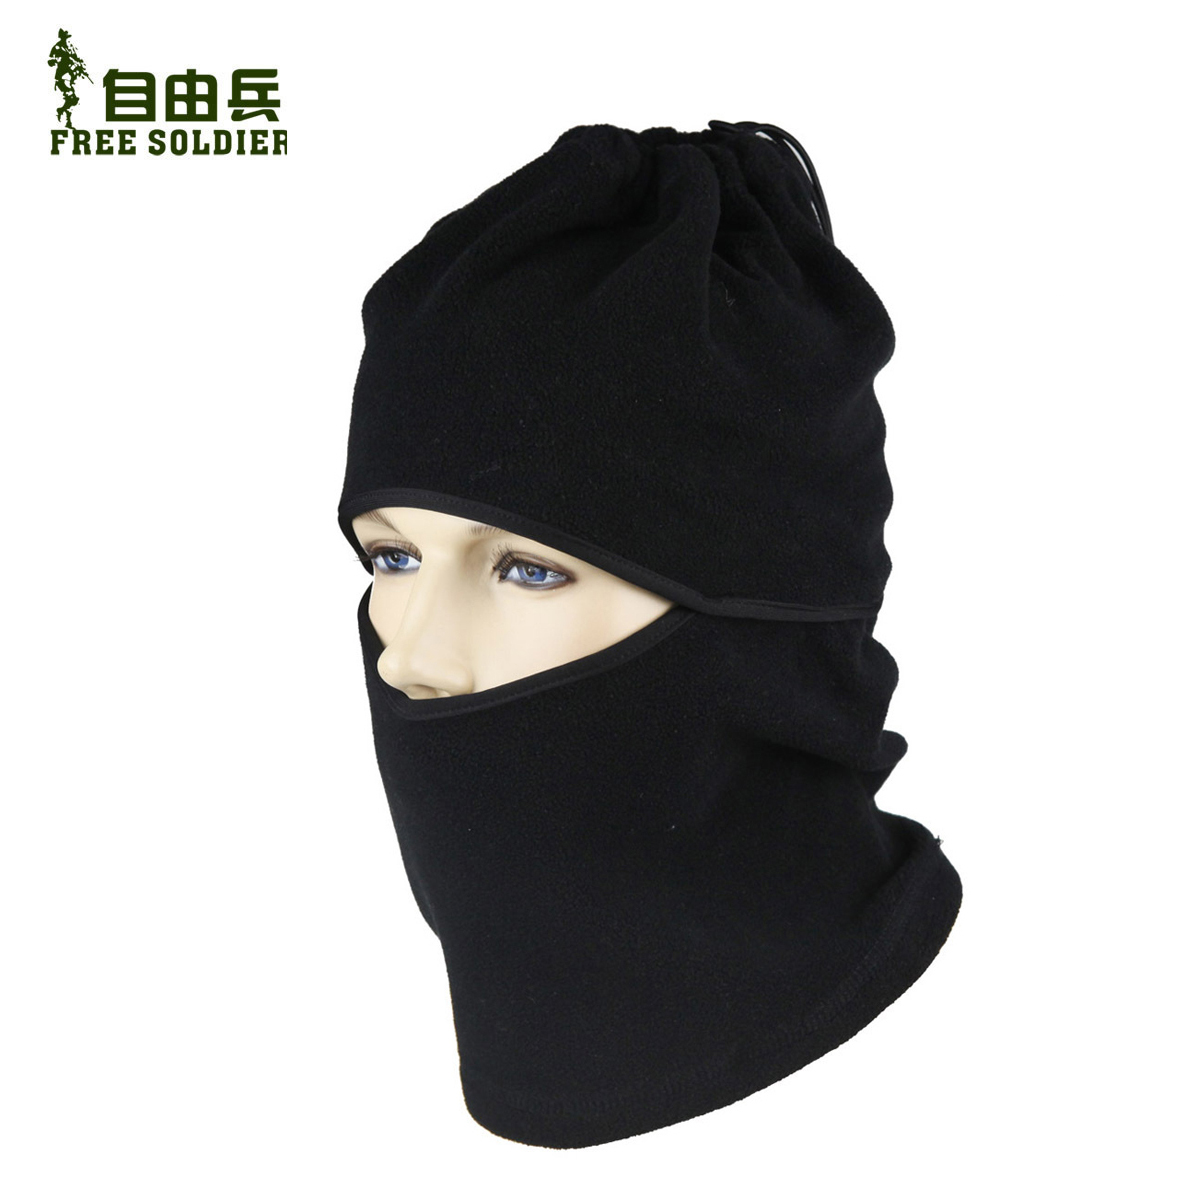 Шапки и кепки для туризма и кемпинга Free Soldier FS/CS02 CS Free Soldier / free soldiers